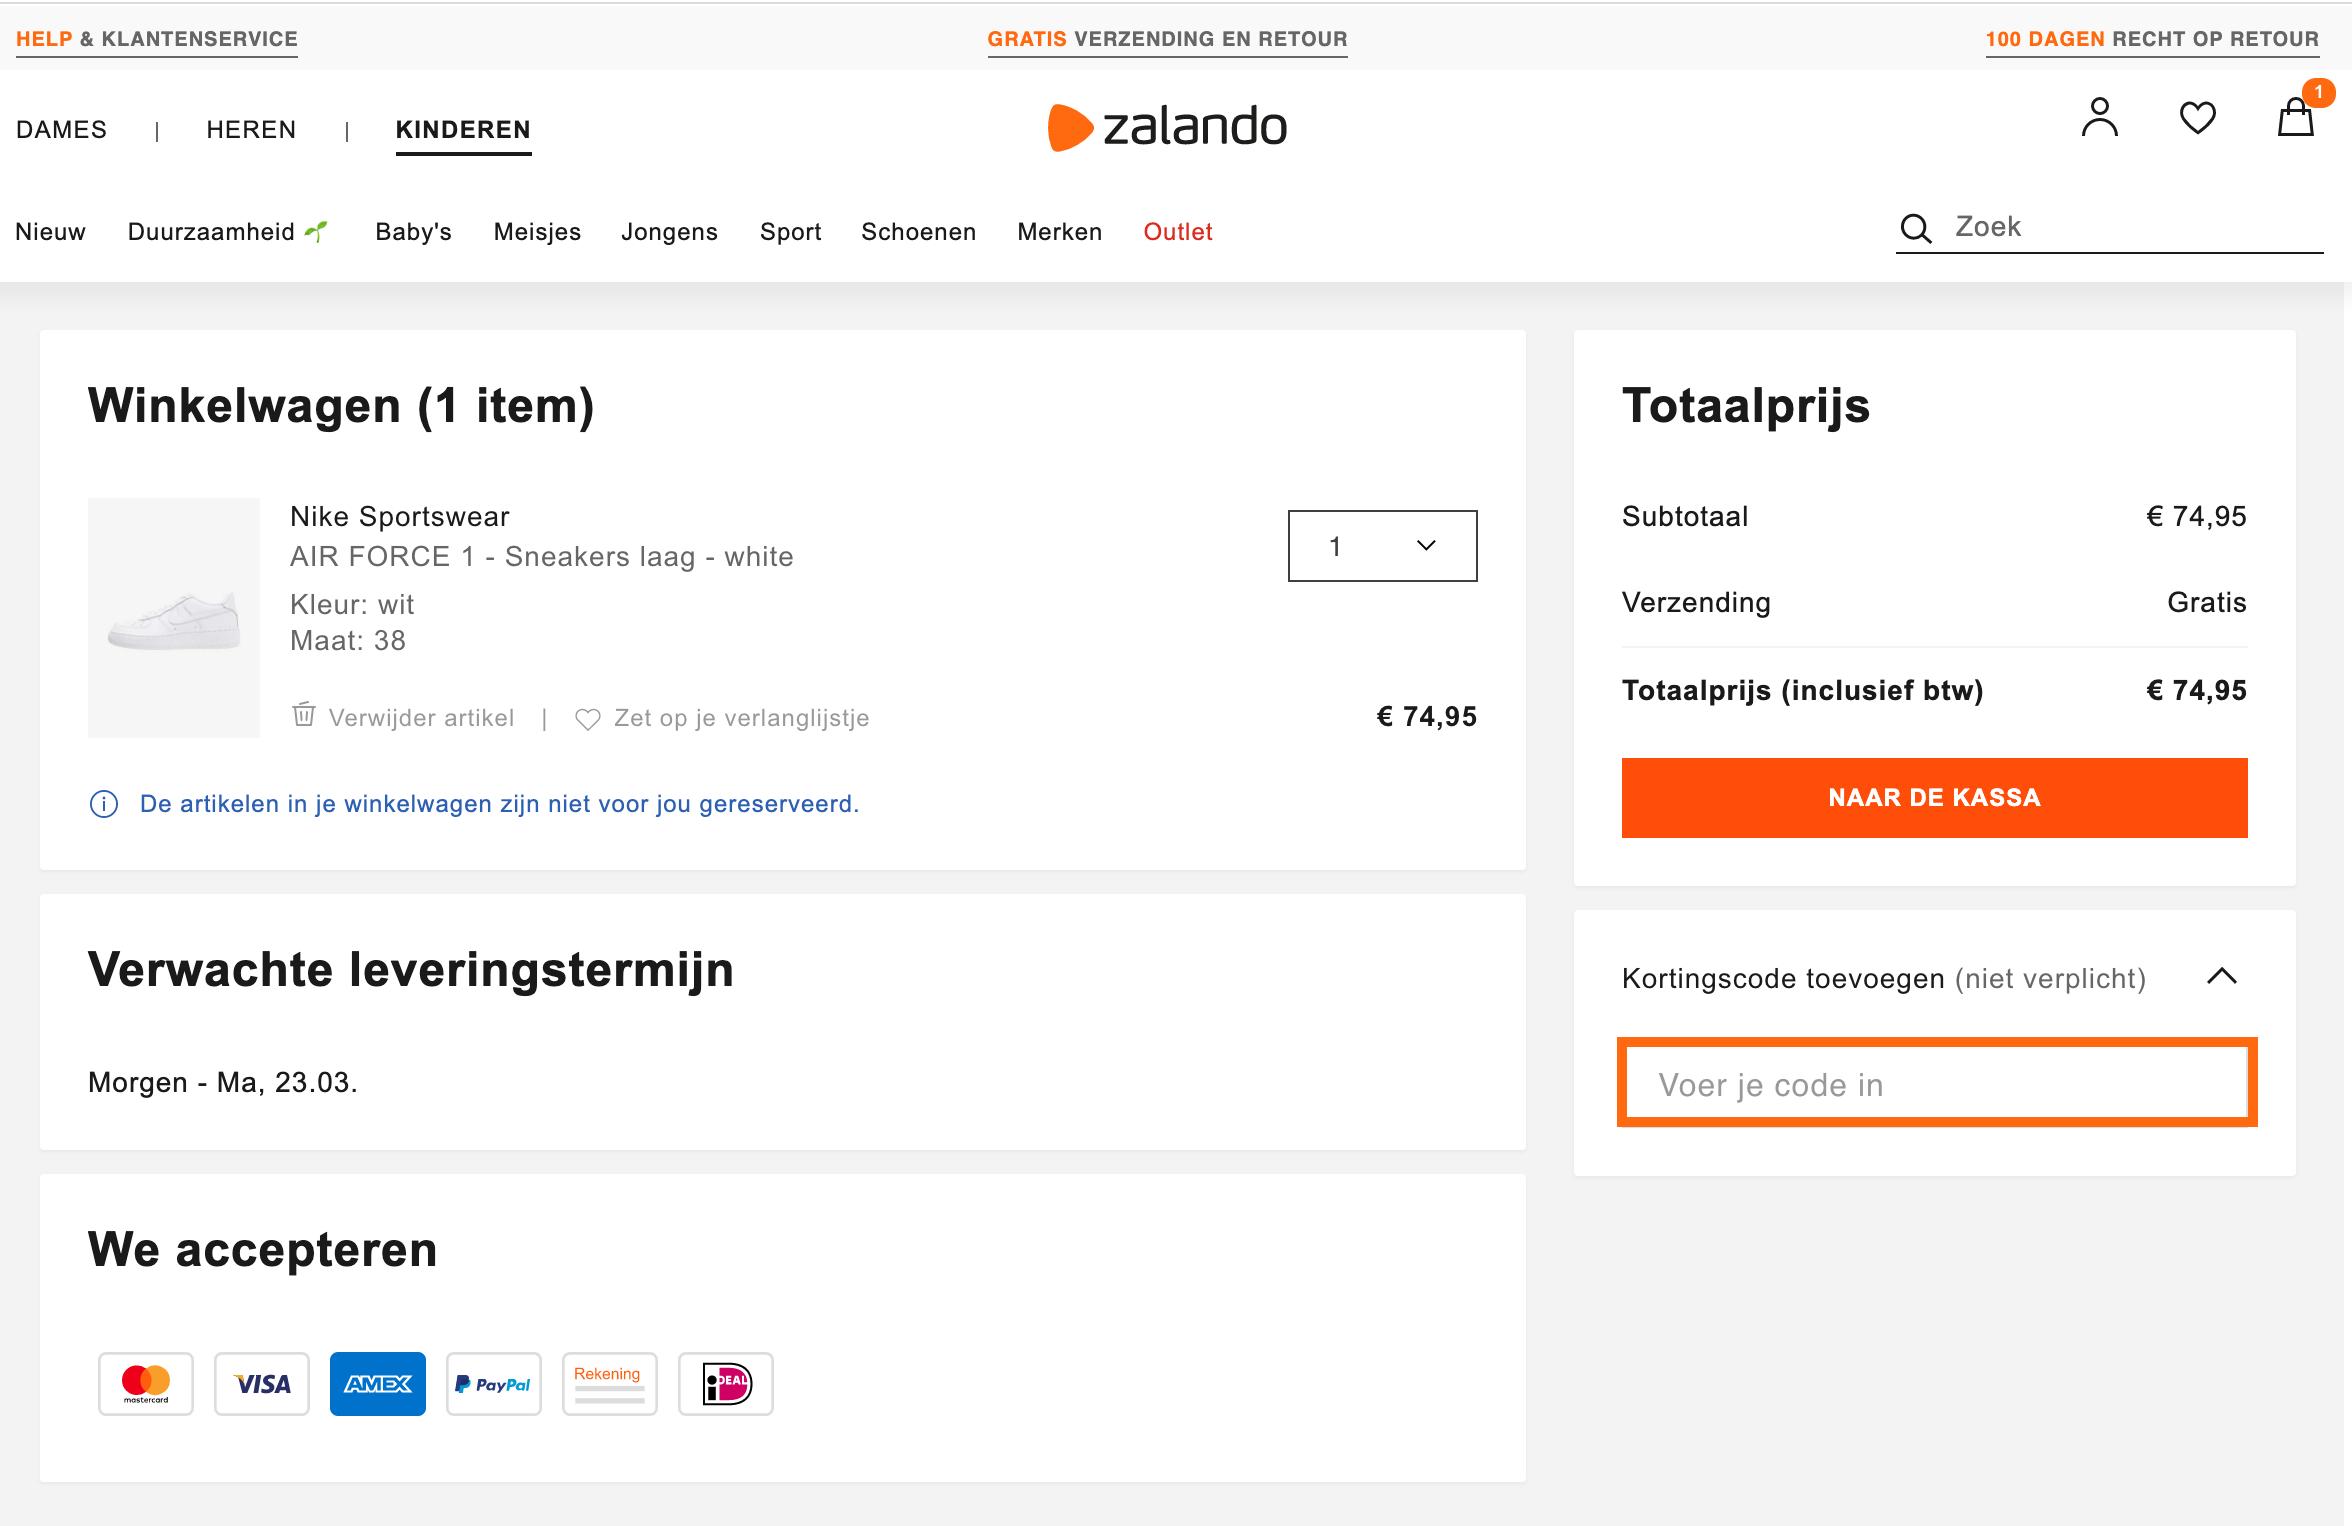 Zalando kortingscode ⇒ Krijg 70% korting, juli 2020